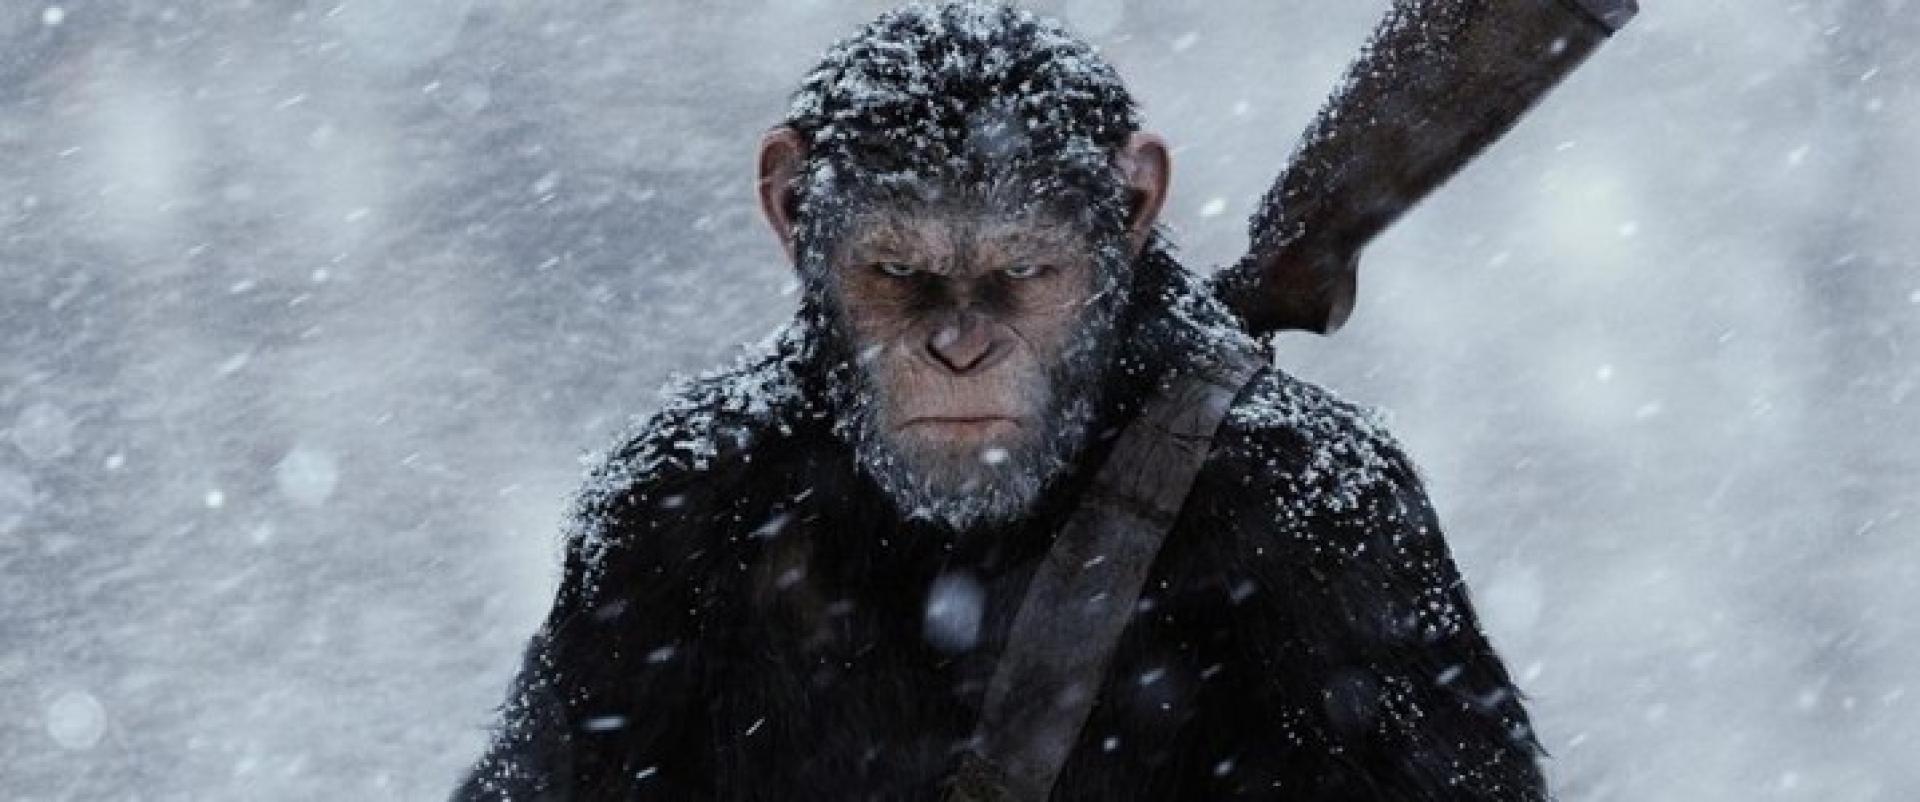 War for the Planet of the Apes - A majmok bolygója: Háború (2017)